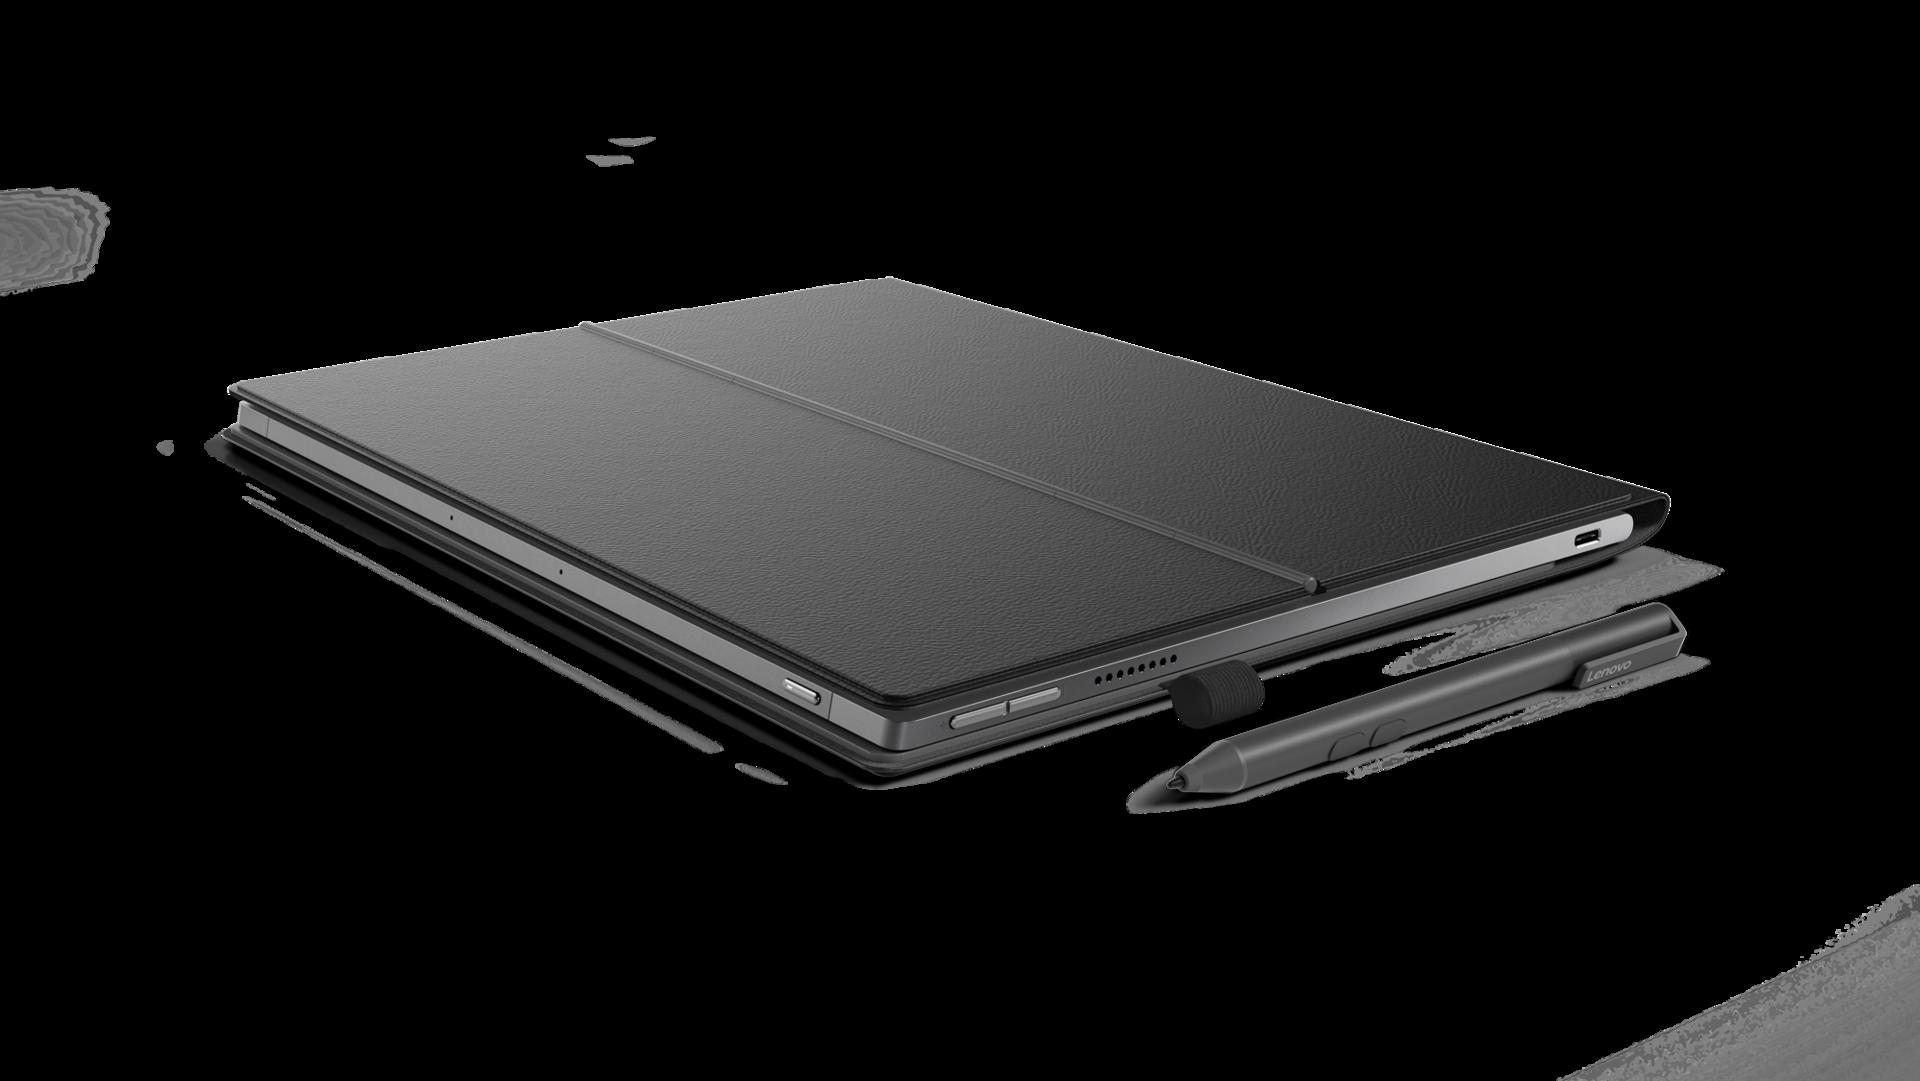 Miix 630 Lenovos Erster Snapdragon 835 Windows Pc Ist Ein